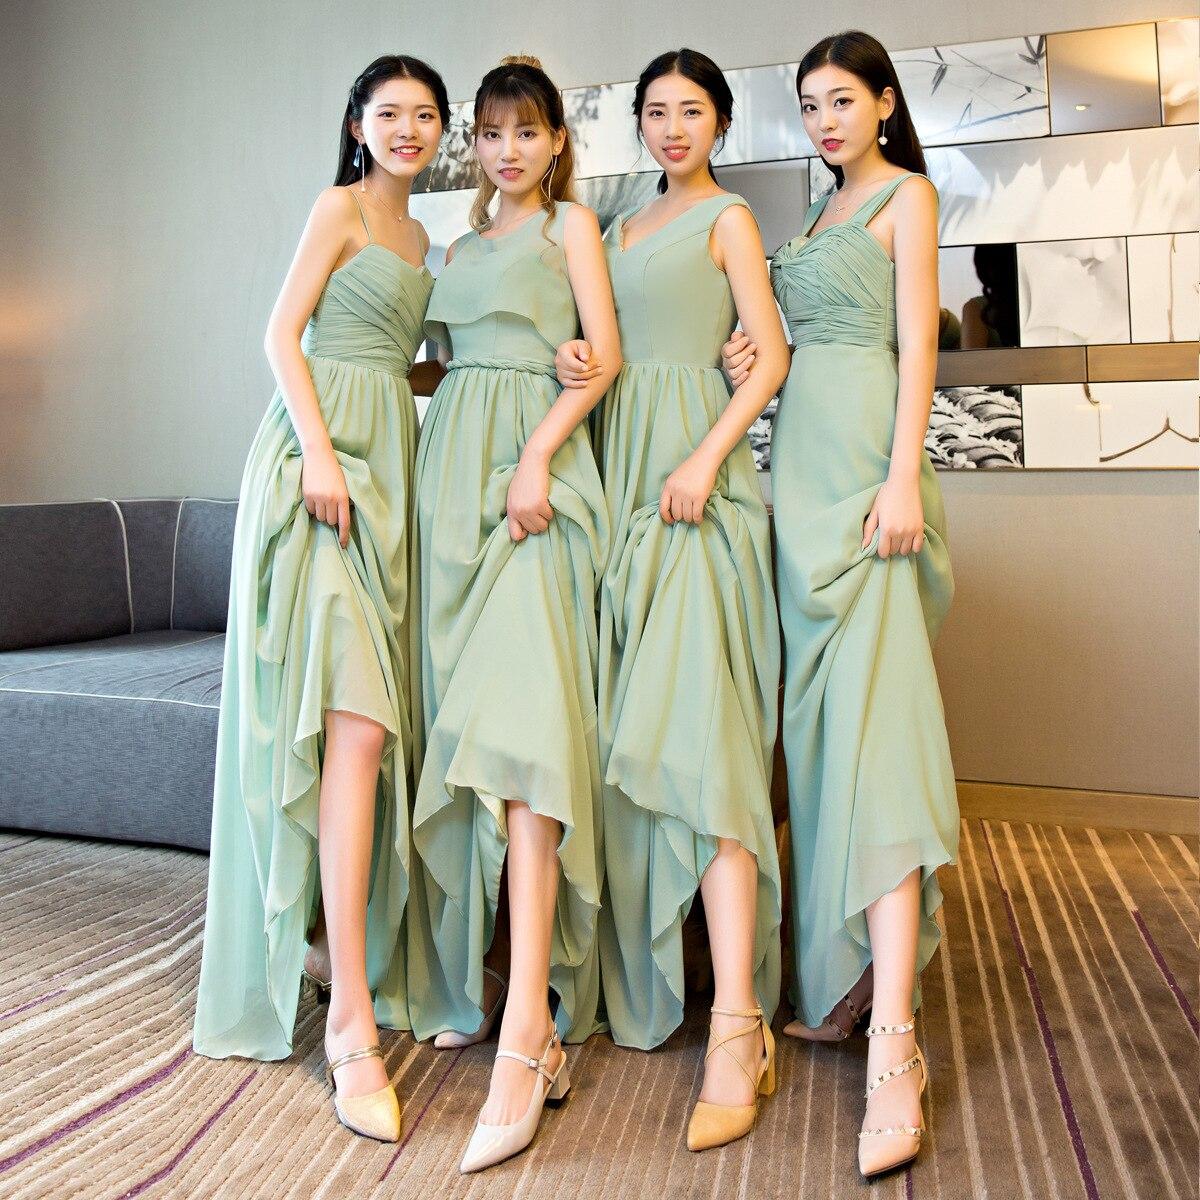 Light Green Elegant   Dress   Women For Wedding Party Long   Bridesmaid     Dresses   Plus Size Chiffon Custom Made   Bridesmaids     Dresses   2020